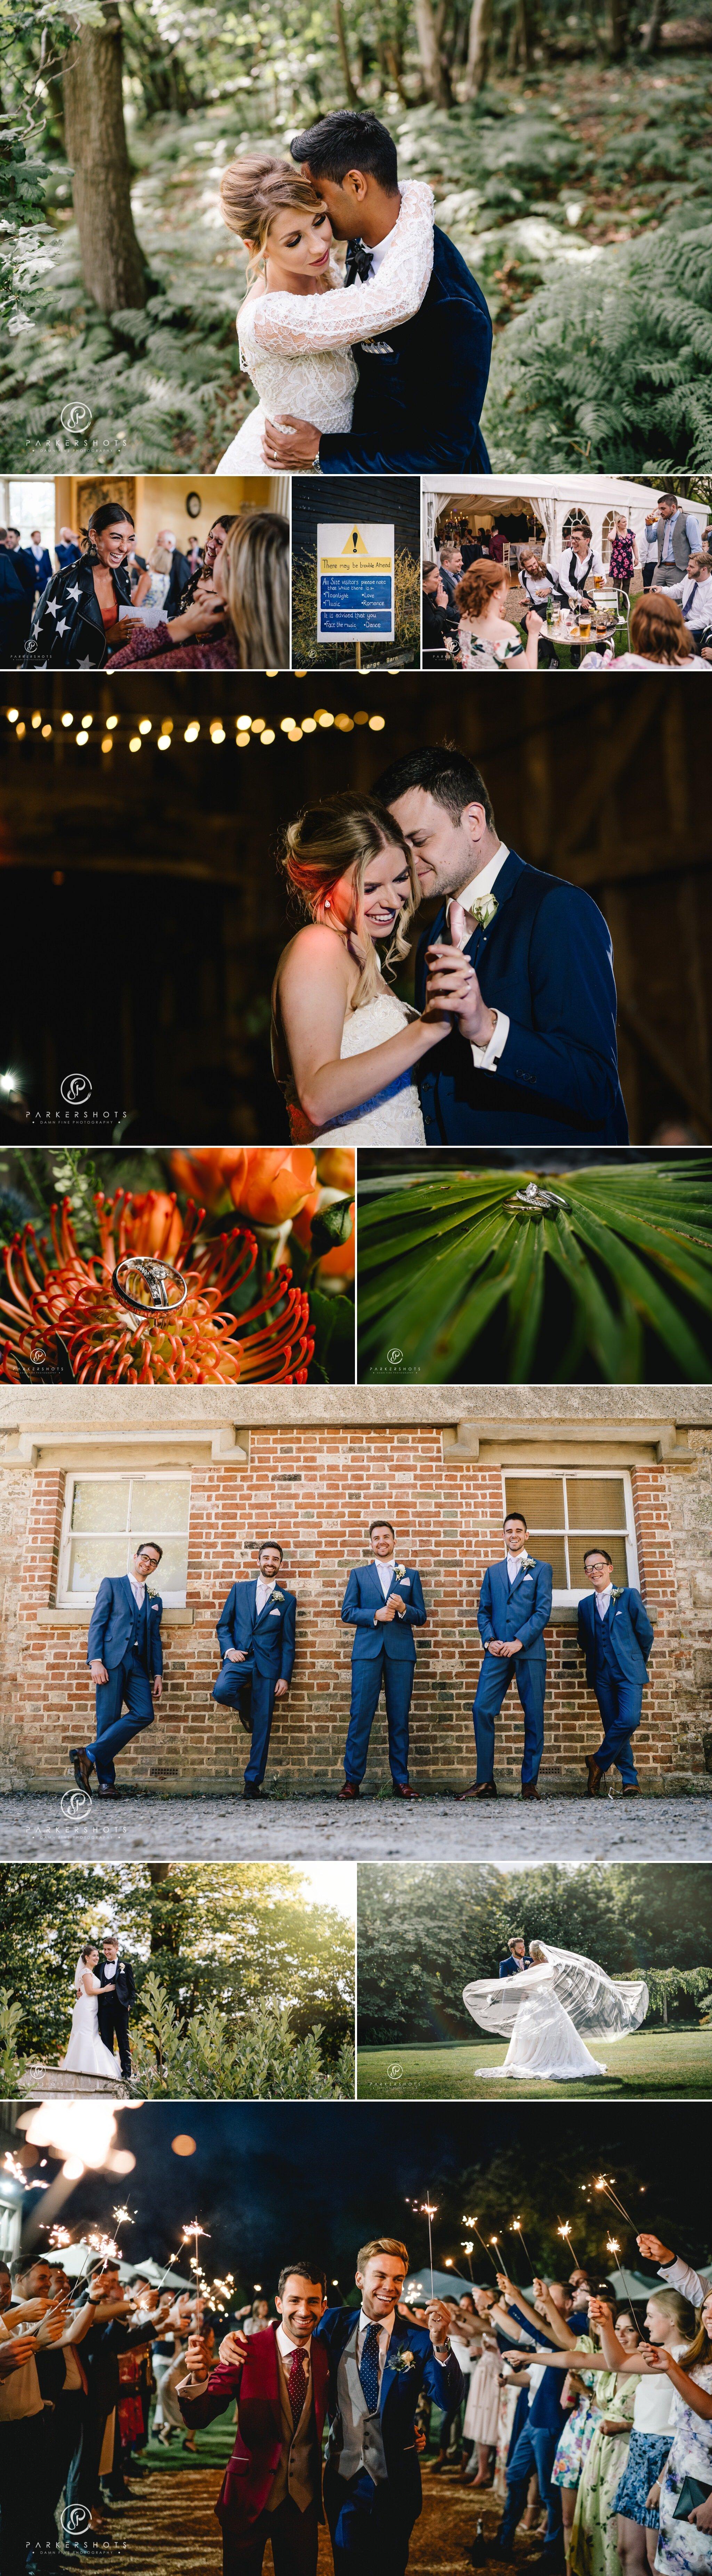 Best of London Wedding Photographers 2019